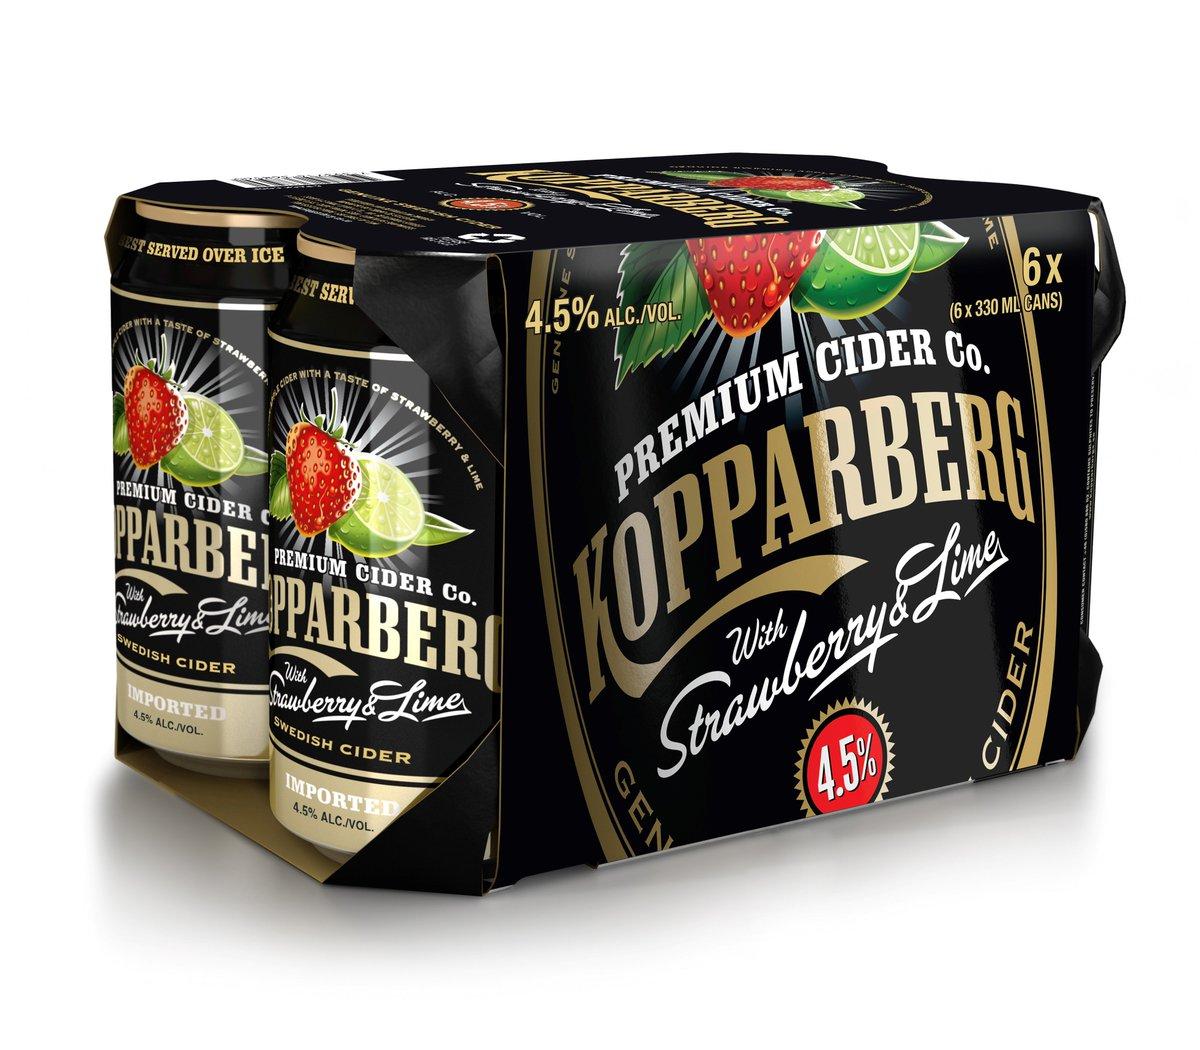 Morrisons kopparberg mixed fruits 250ml product information - 0 Replies Retweets 4 Likes Kopparberg Sa Kopparbergsa Twitter Source Kopparberg Mixed Fruit Cider